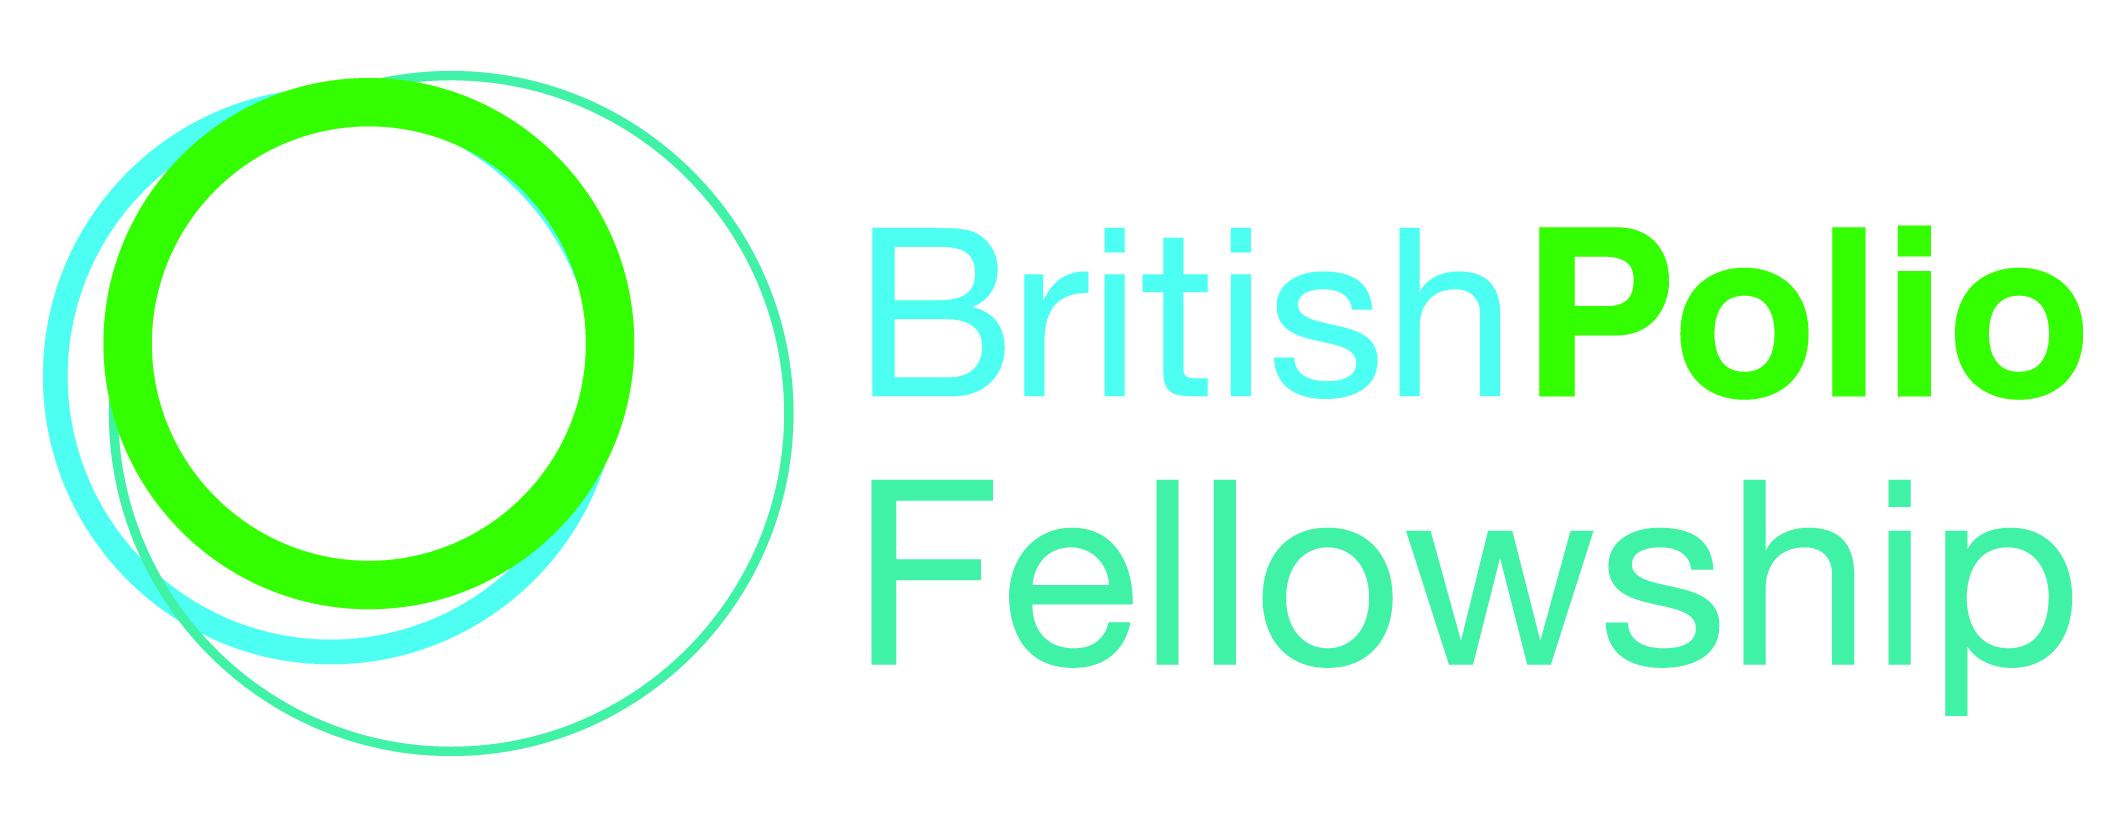 Copy of British Polio Fellowship